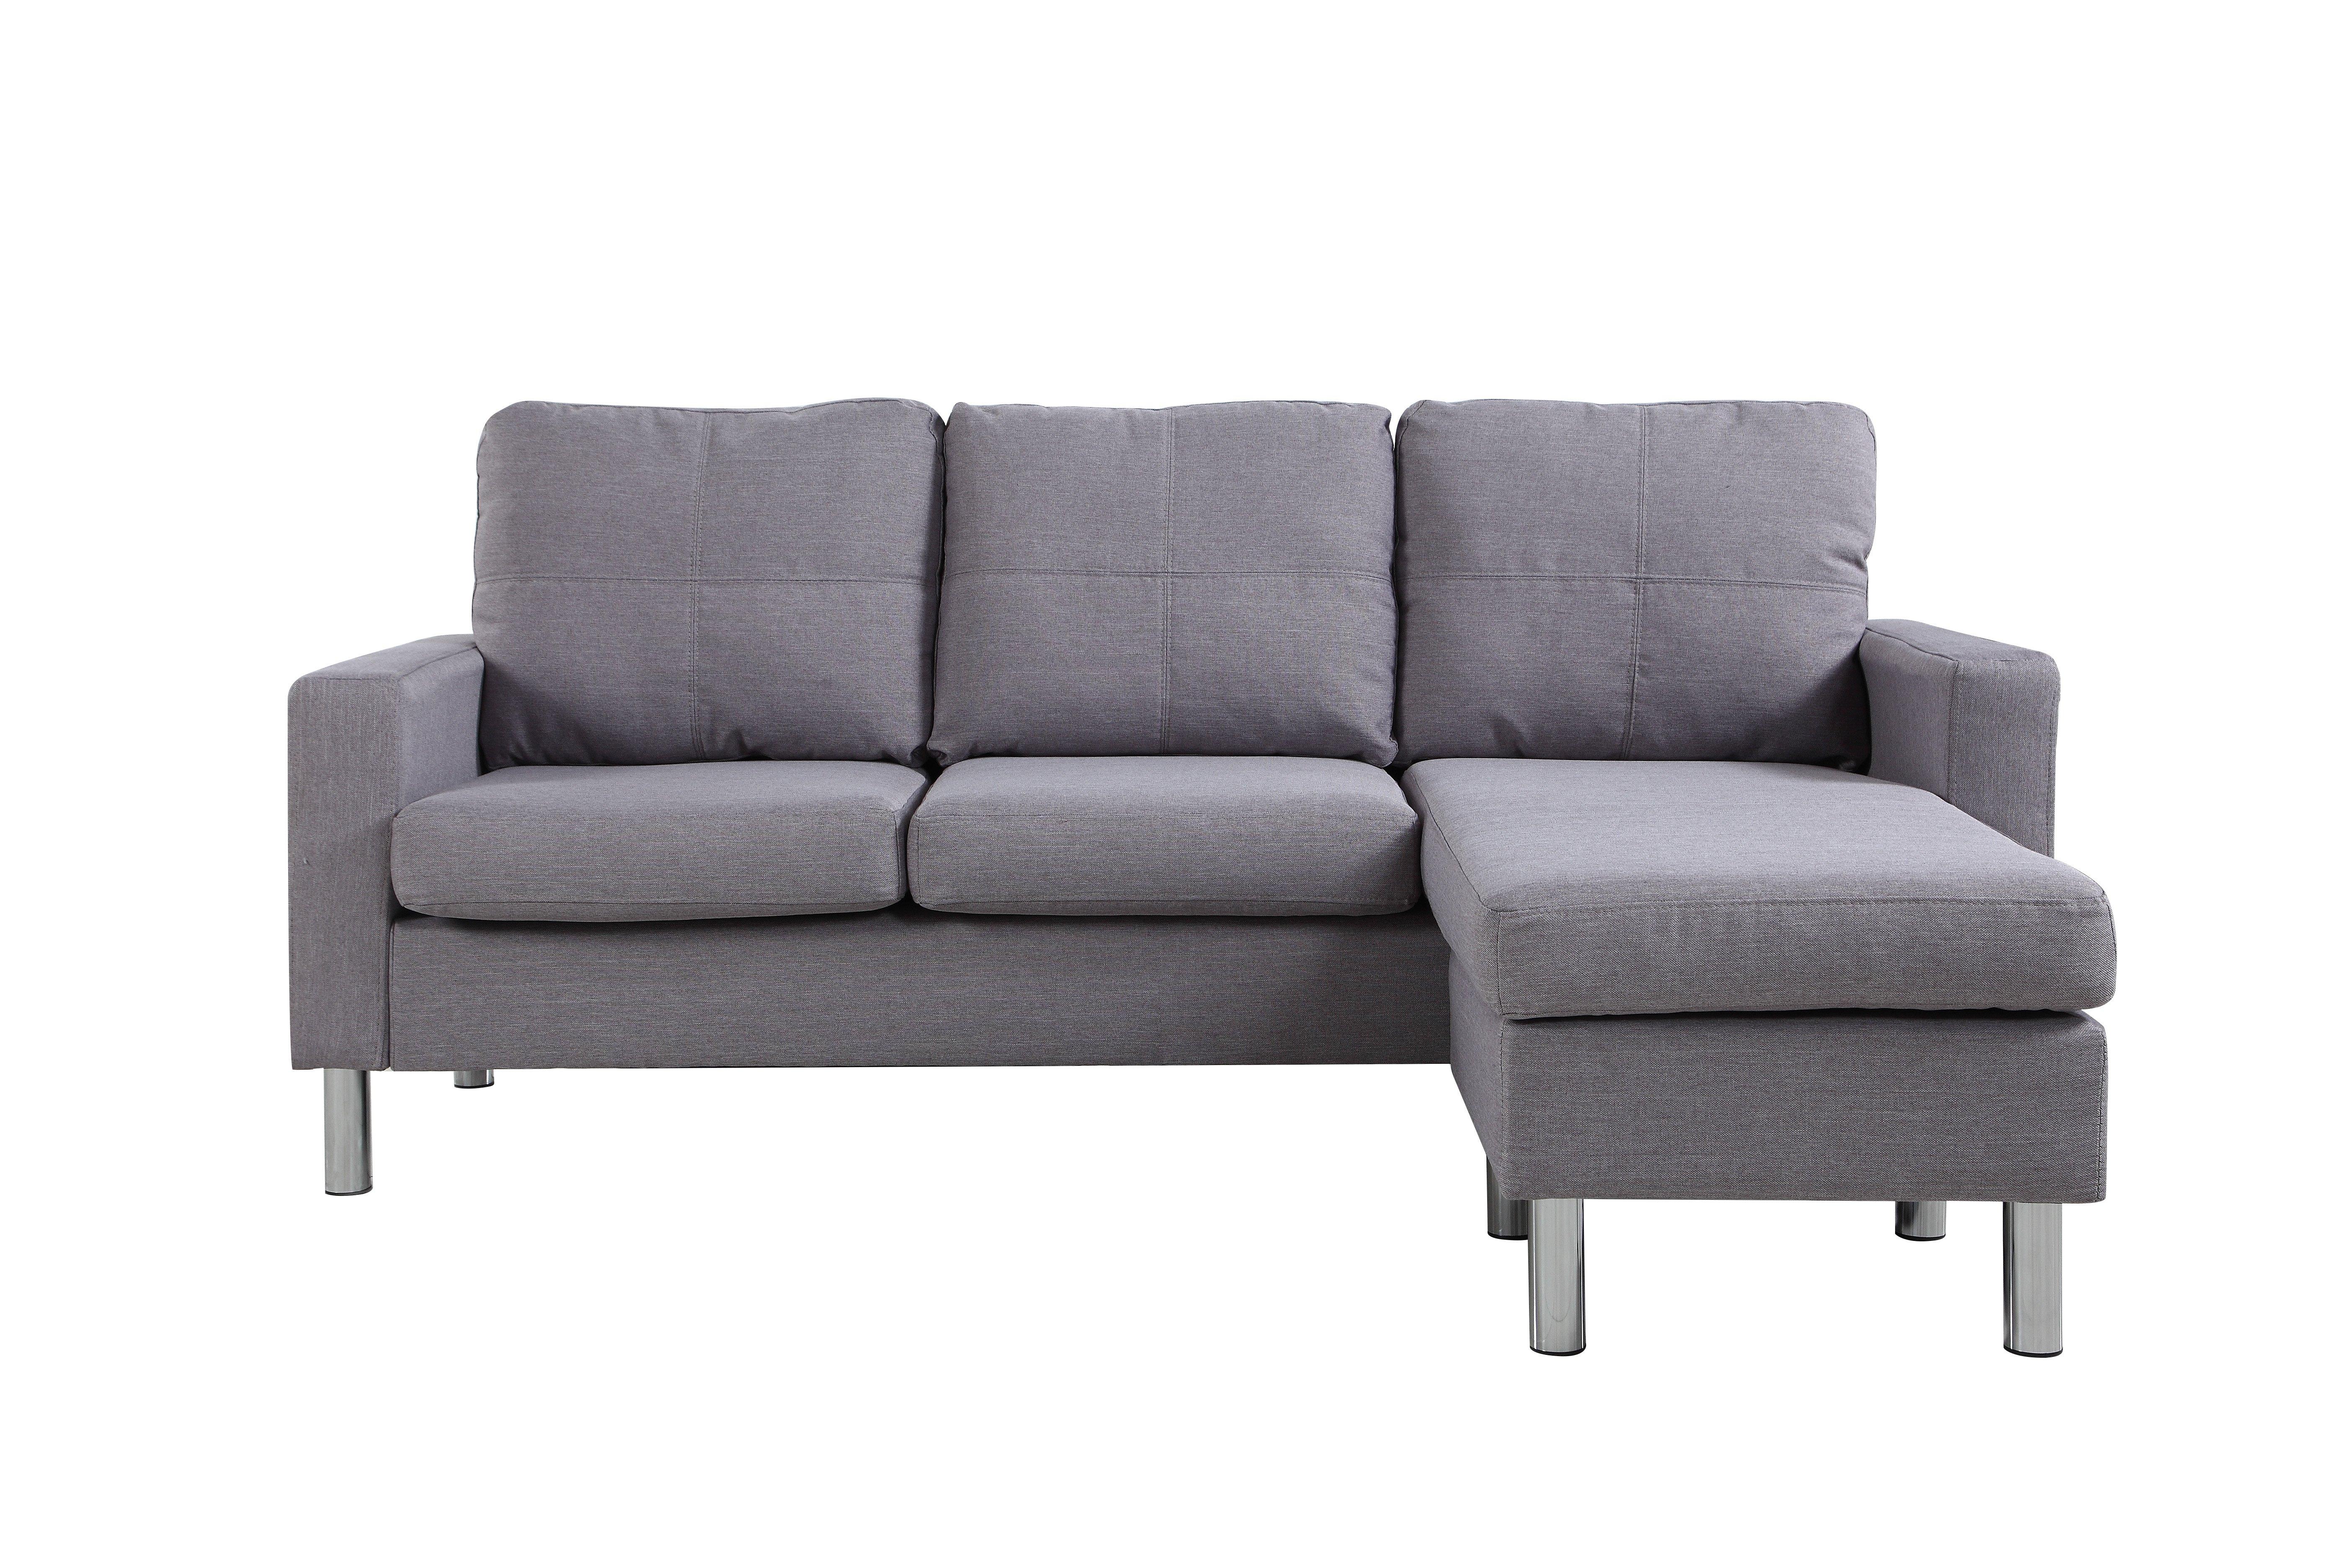 Modern Living Reversible Linen Fabric Sectional Sofa Light Grey Ebay